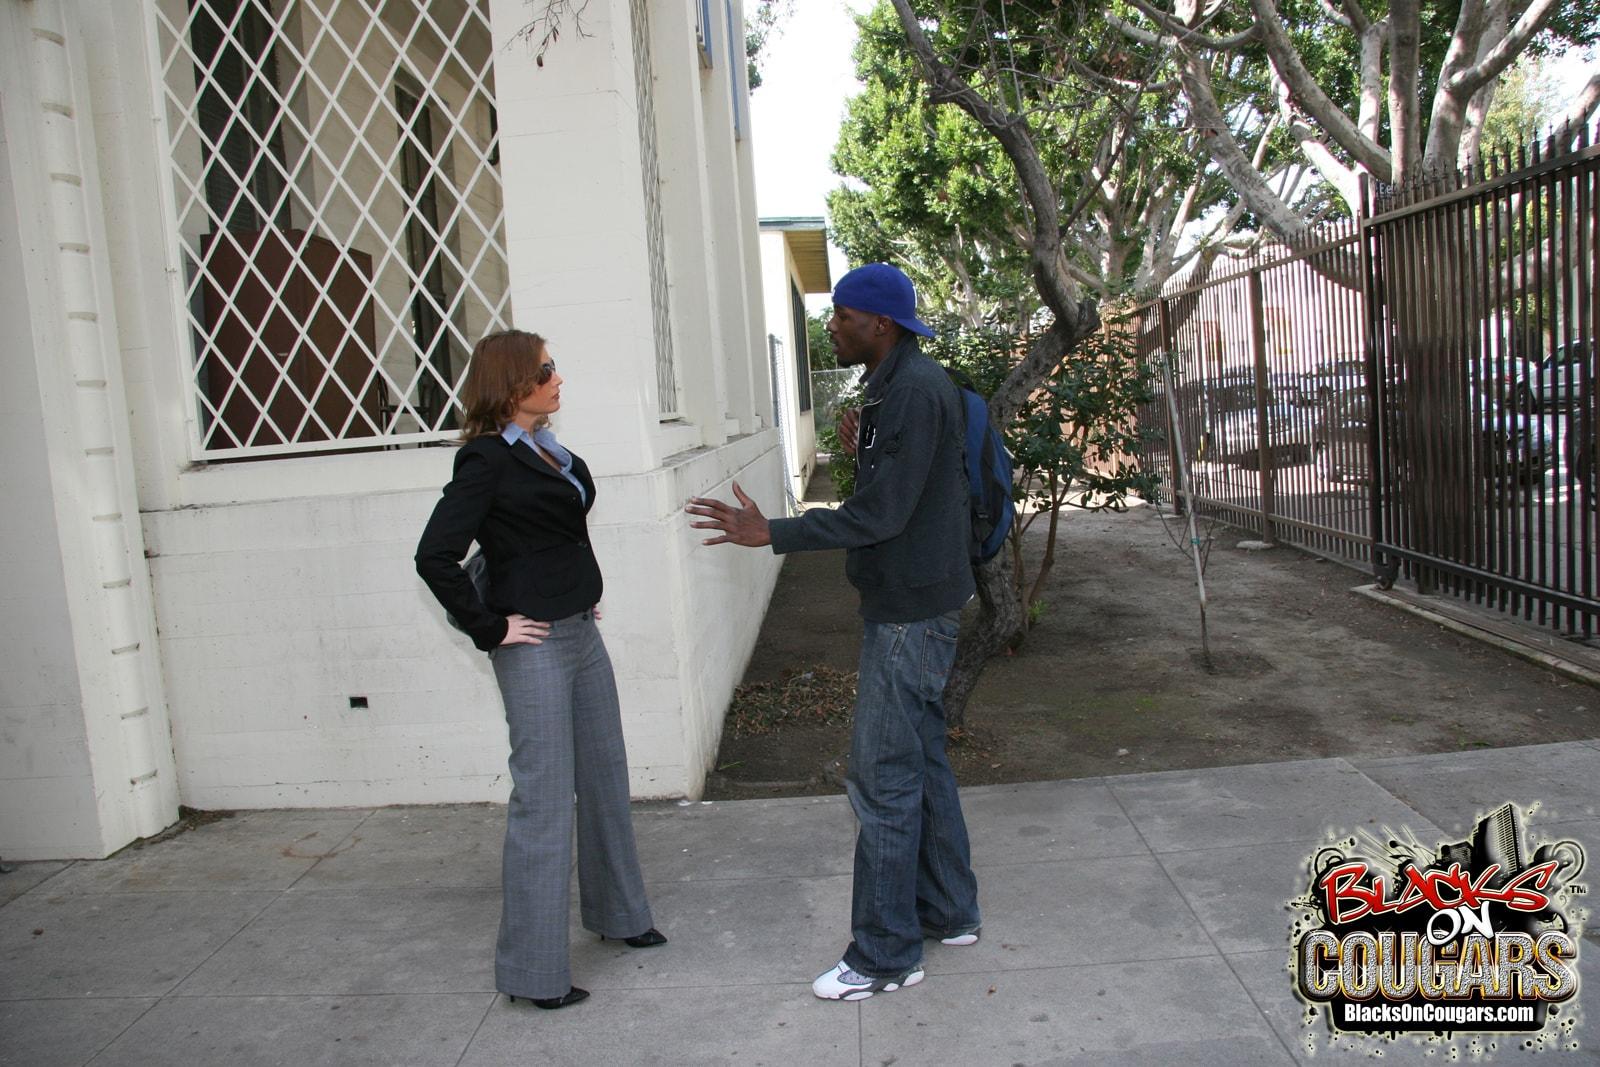 Dogfart '- Blacks On Cougars' starring Rae Rogers (Photo 1)